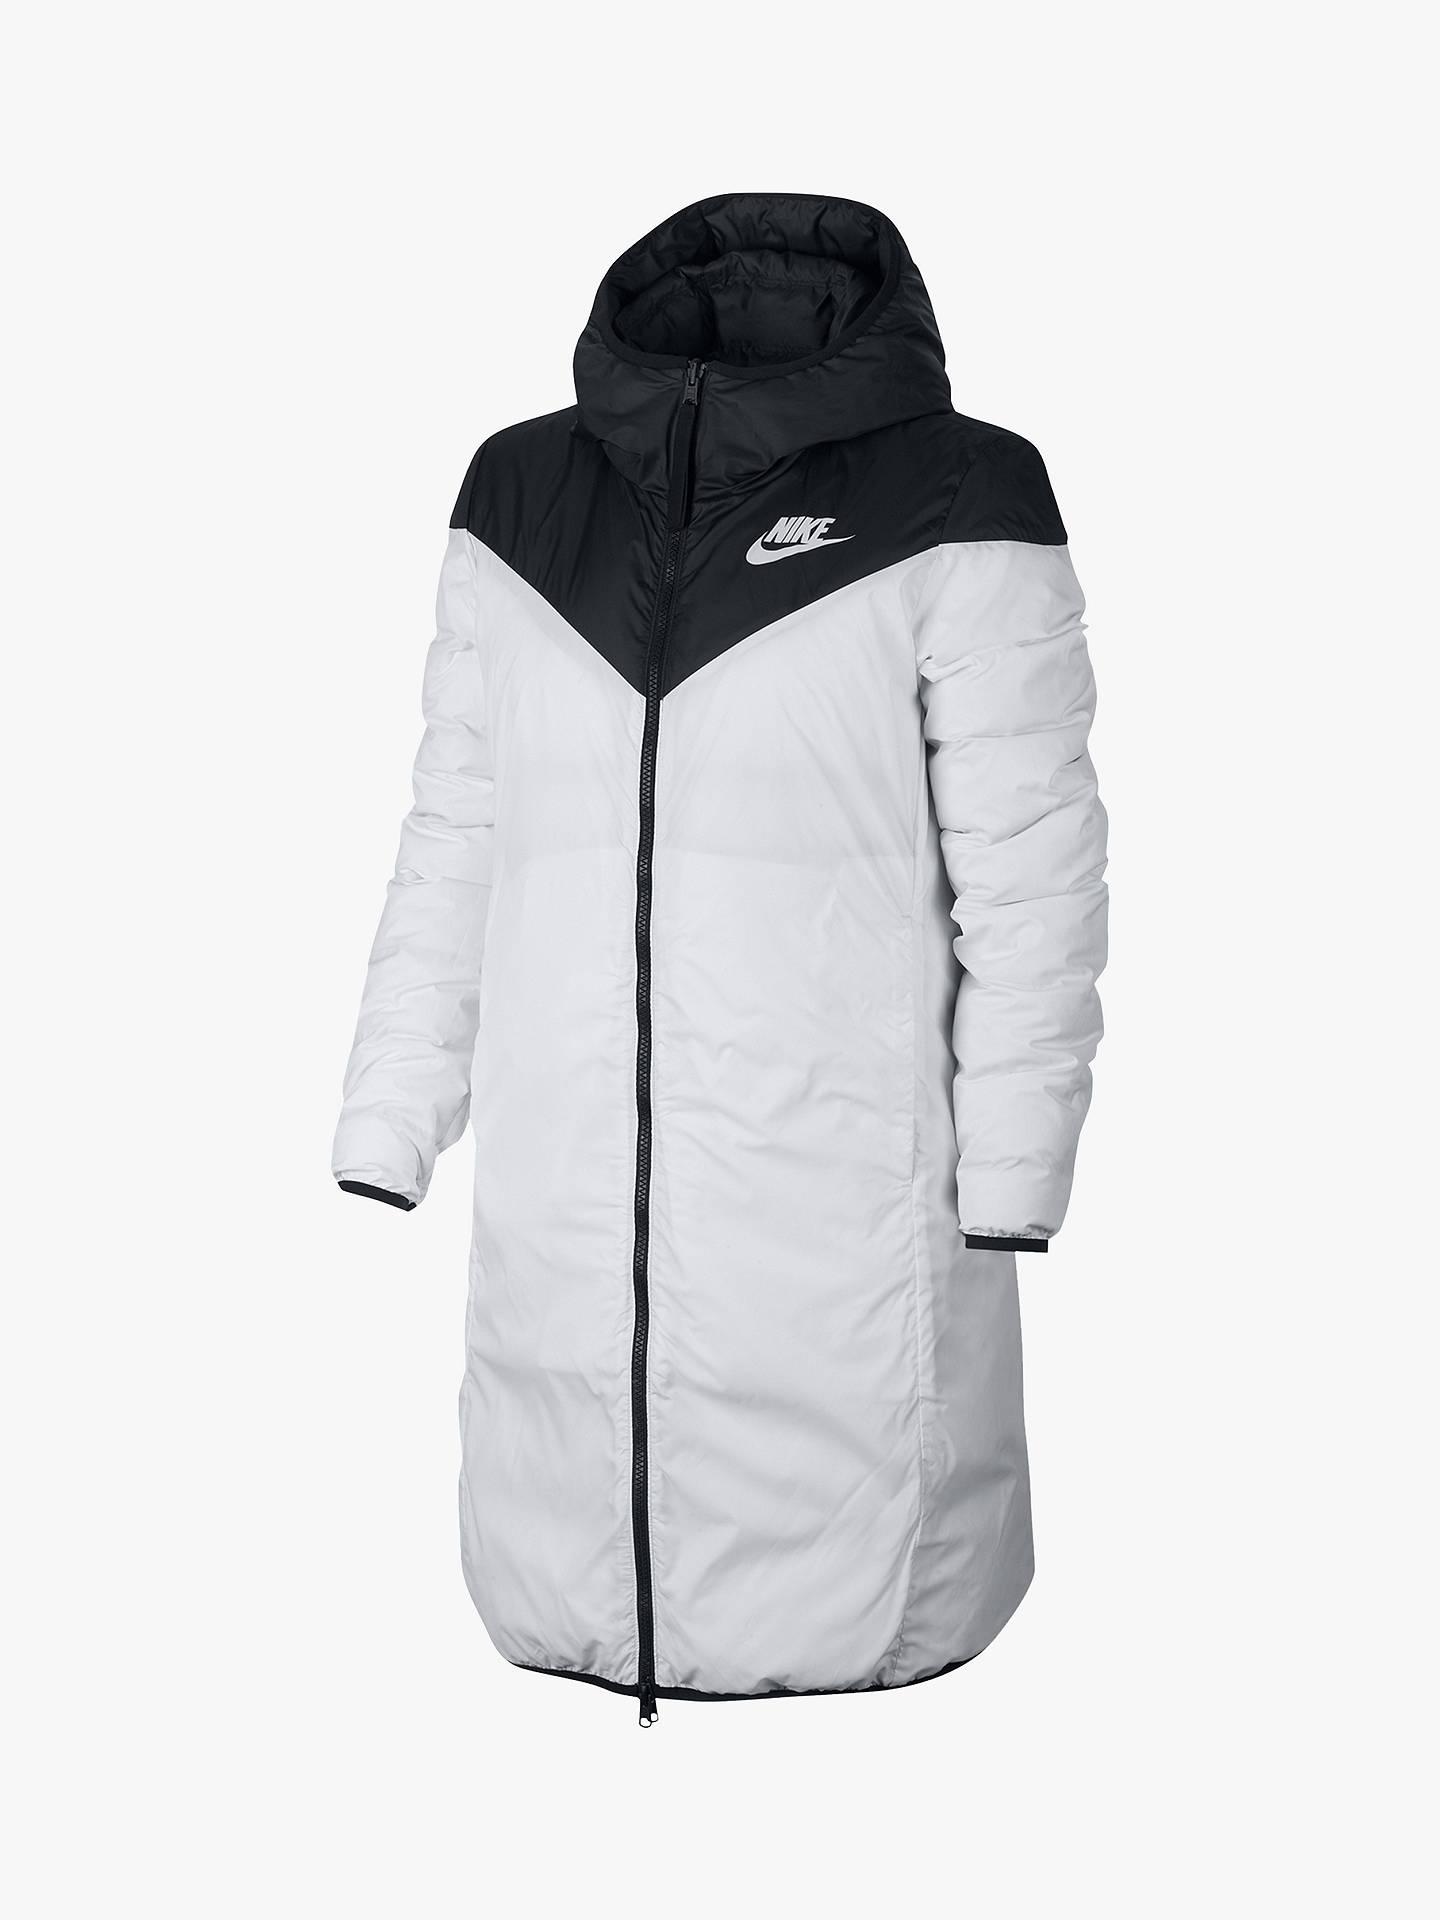 5fc5c473a562 ... Buy Nike Down Fill Women s Reversible Parka Coat